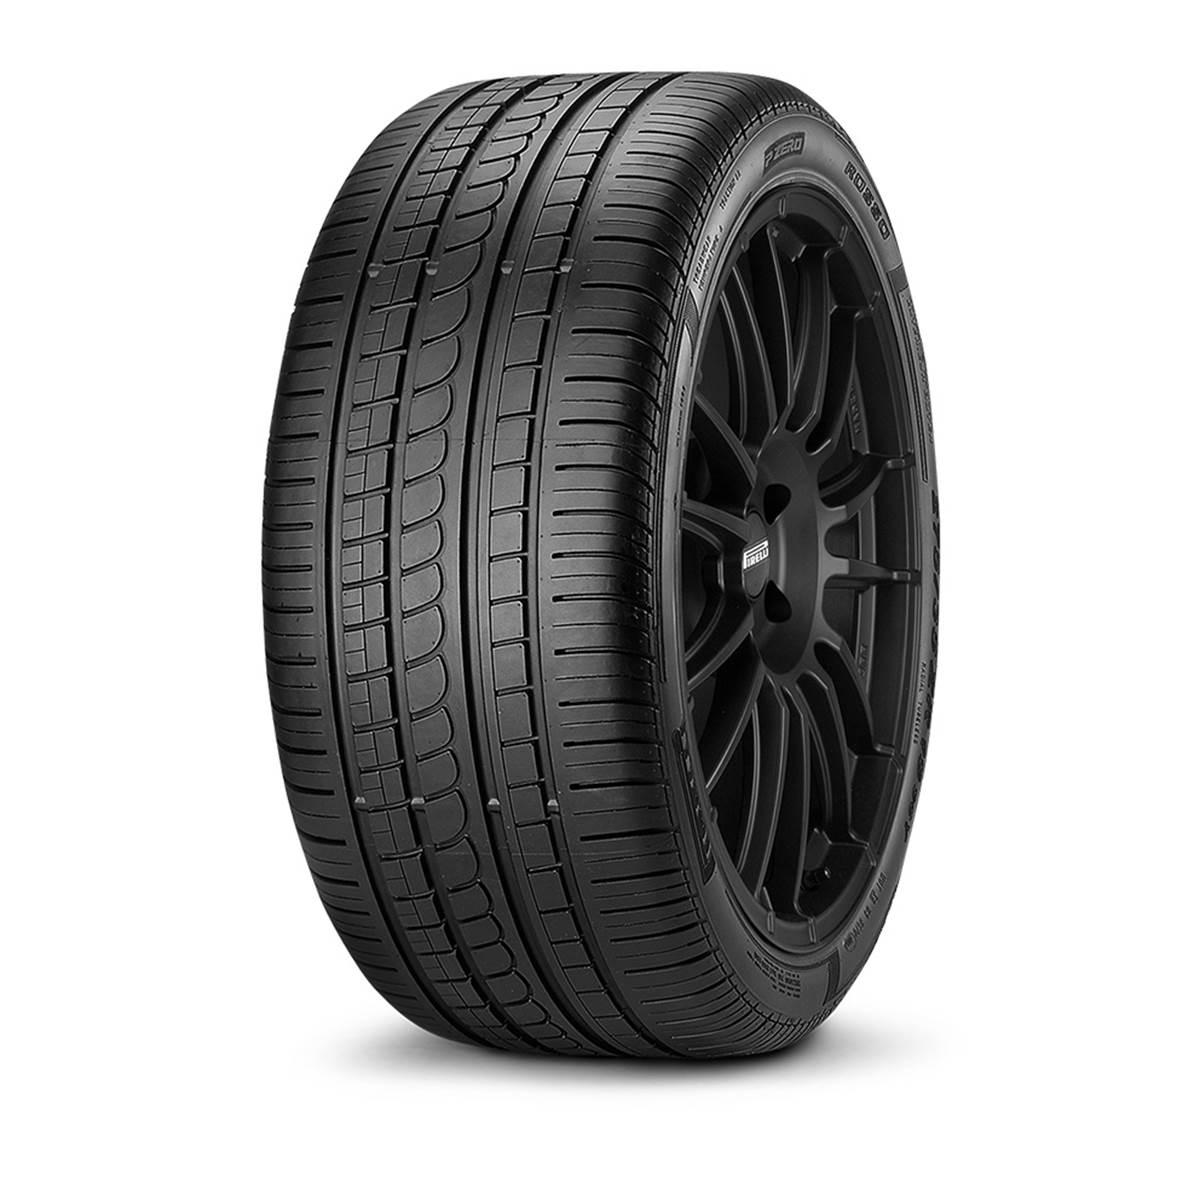 Pneu Pirelli 225/50R17 98Y Pzero Nero (Gt) XL